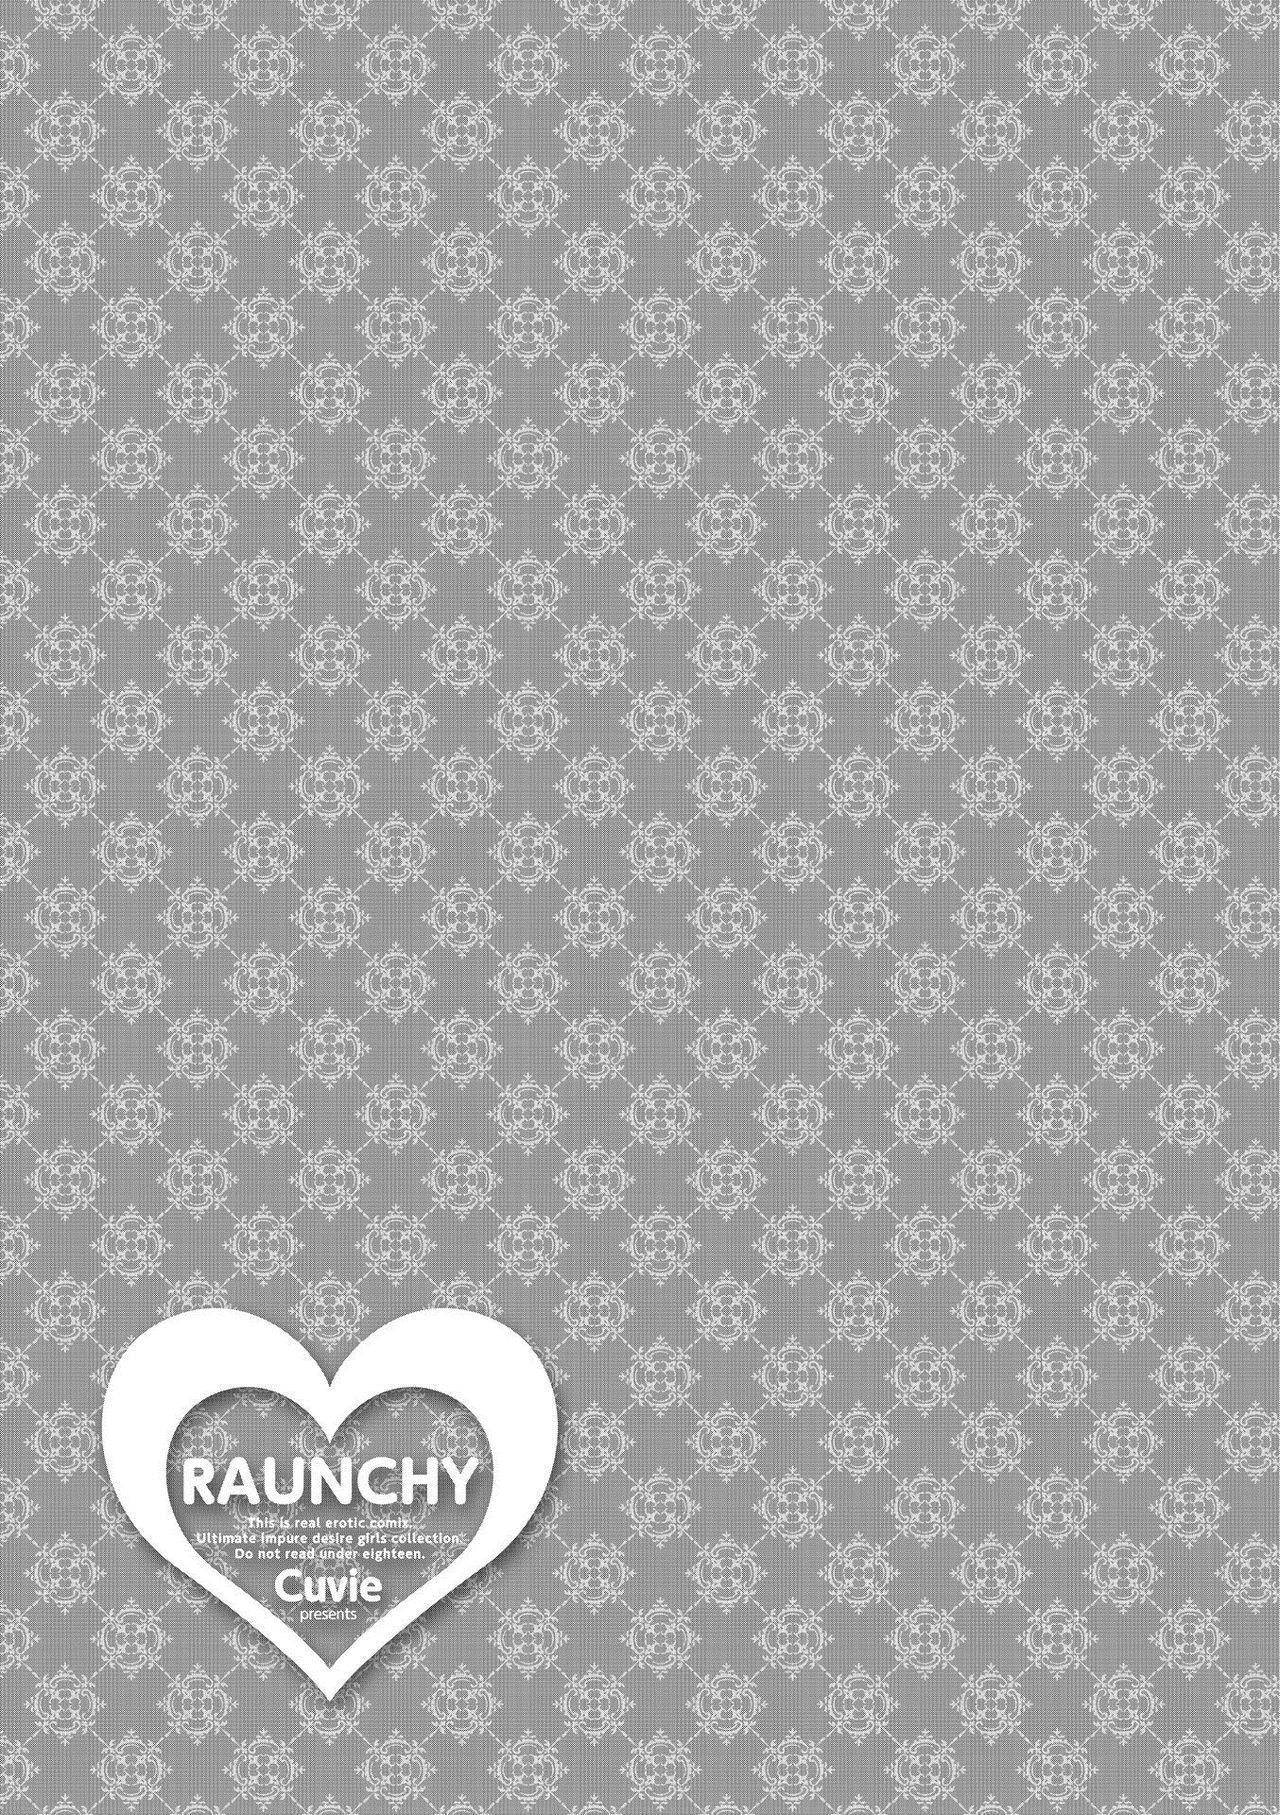 RAUNCHY 240